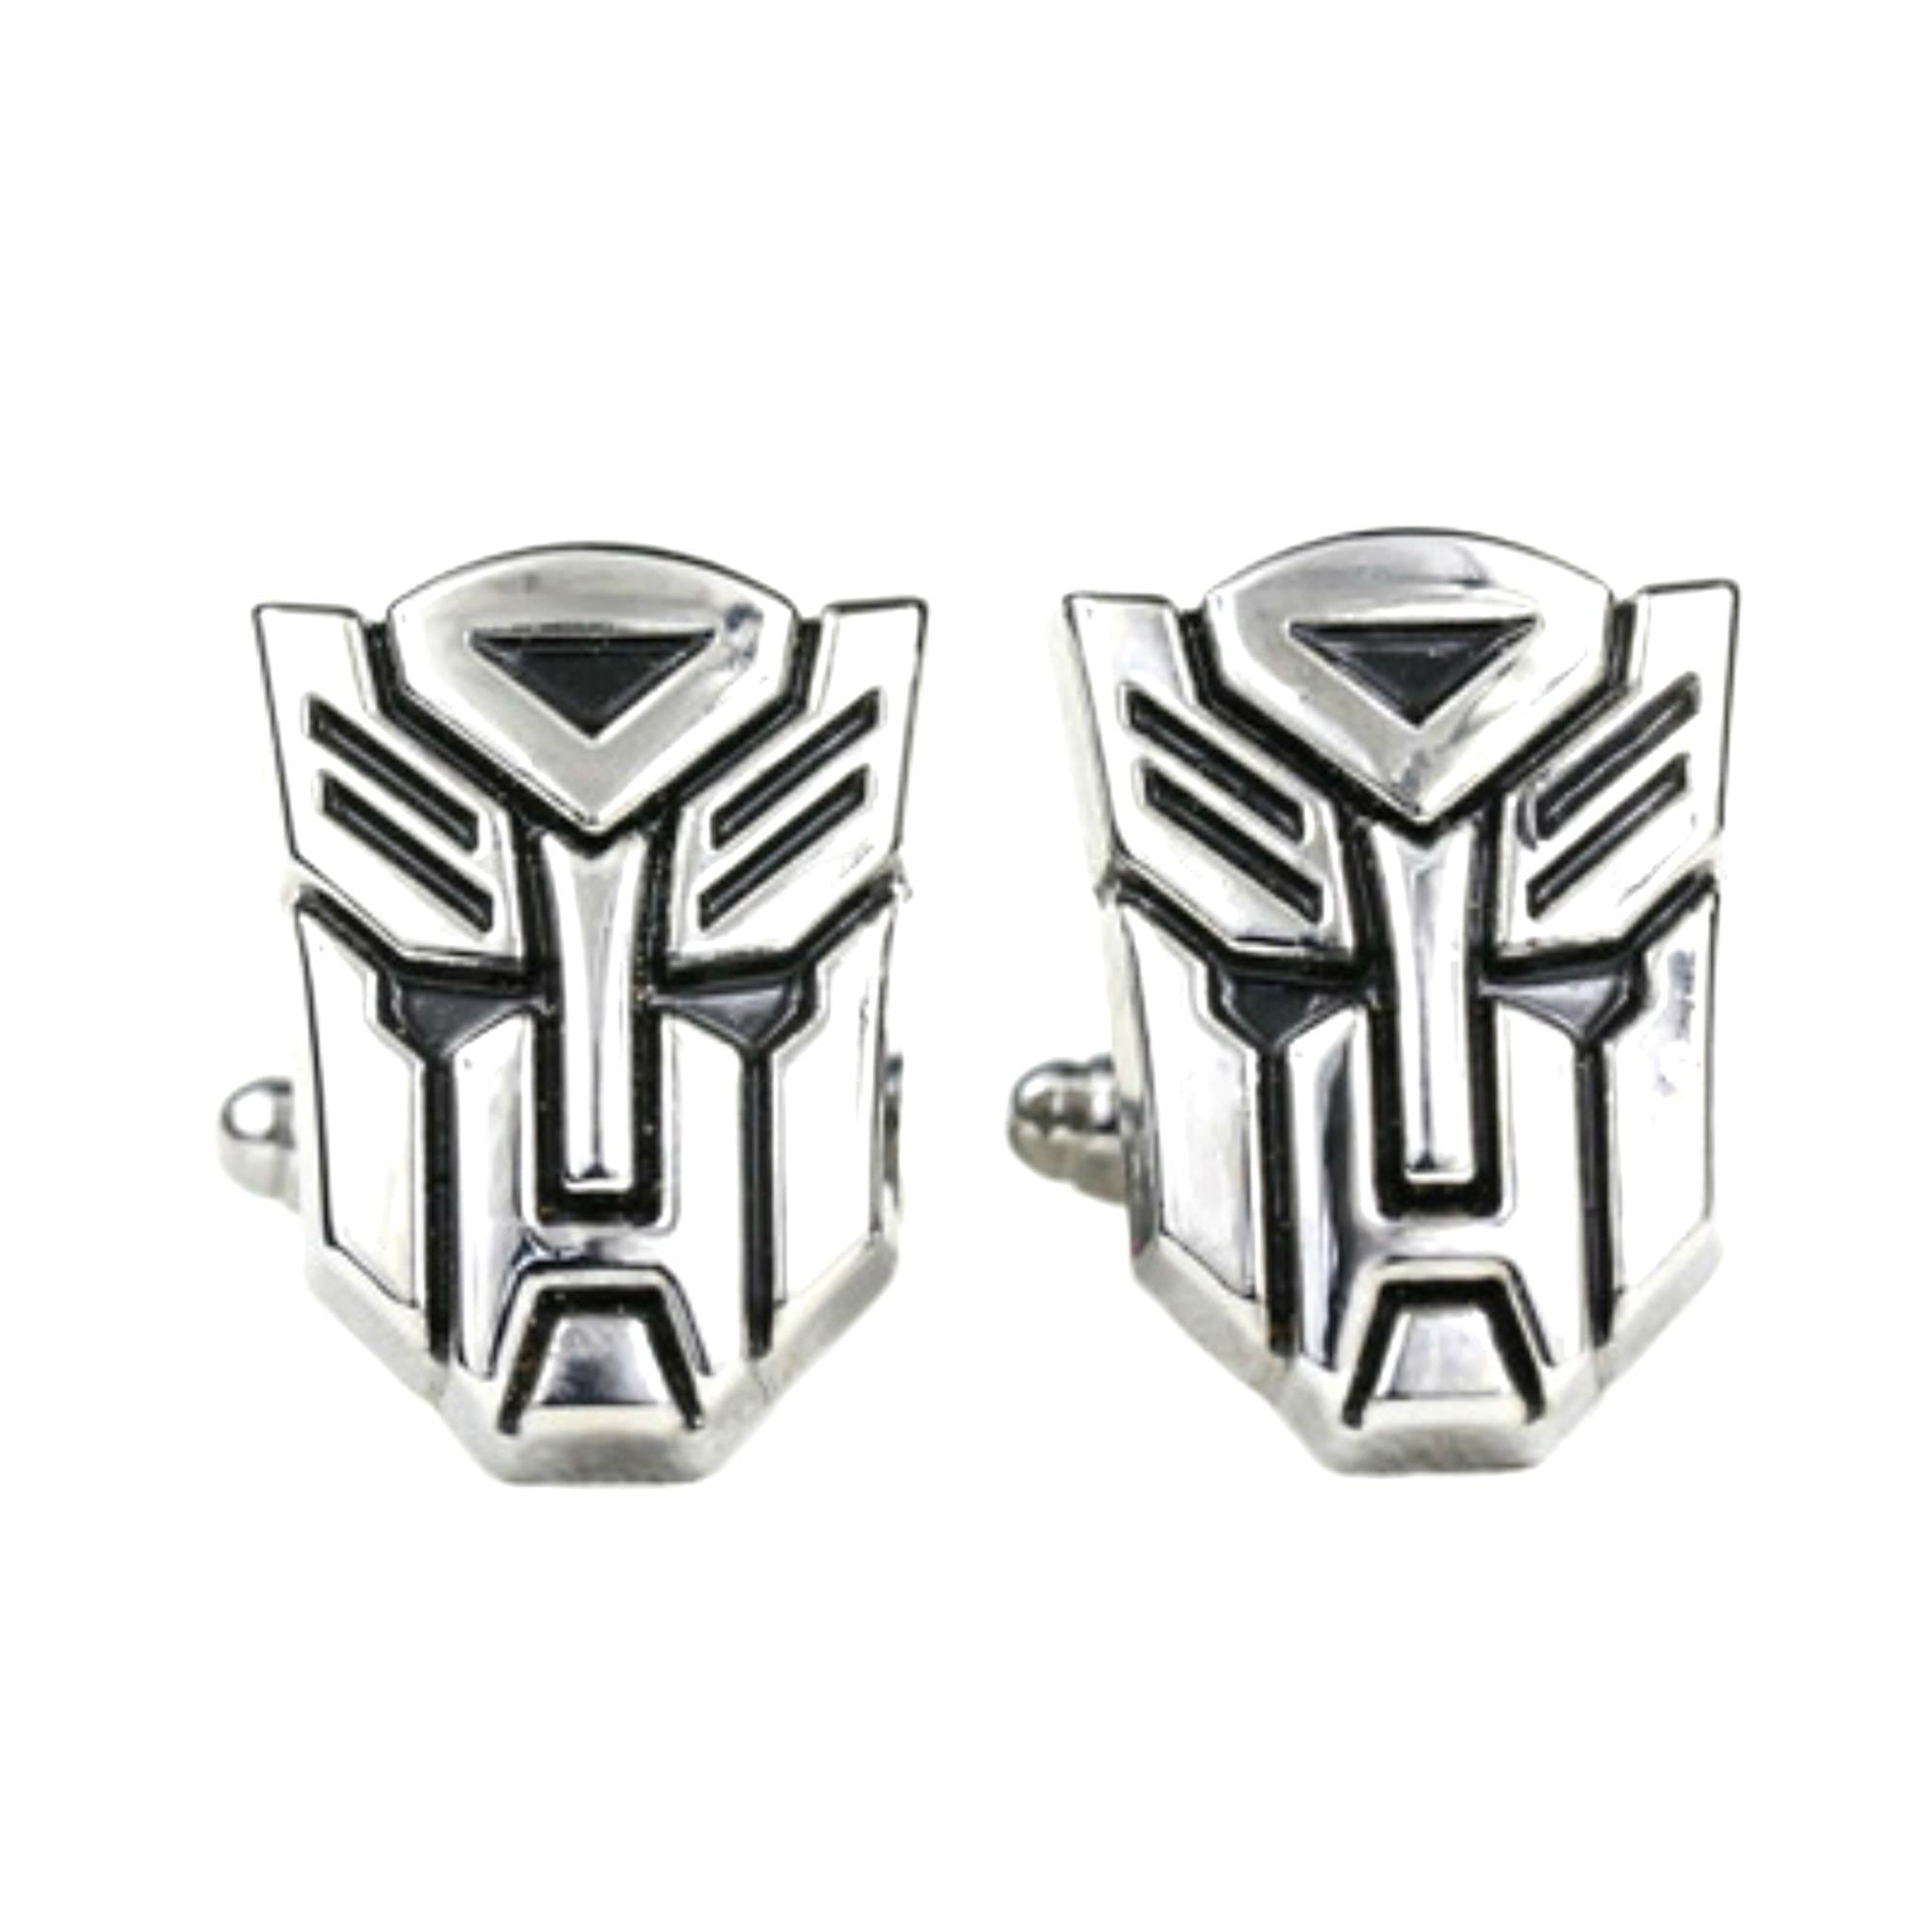 Superheroes Transformers Optimus Prime Autobots Cufflinks